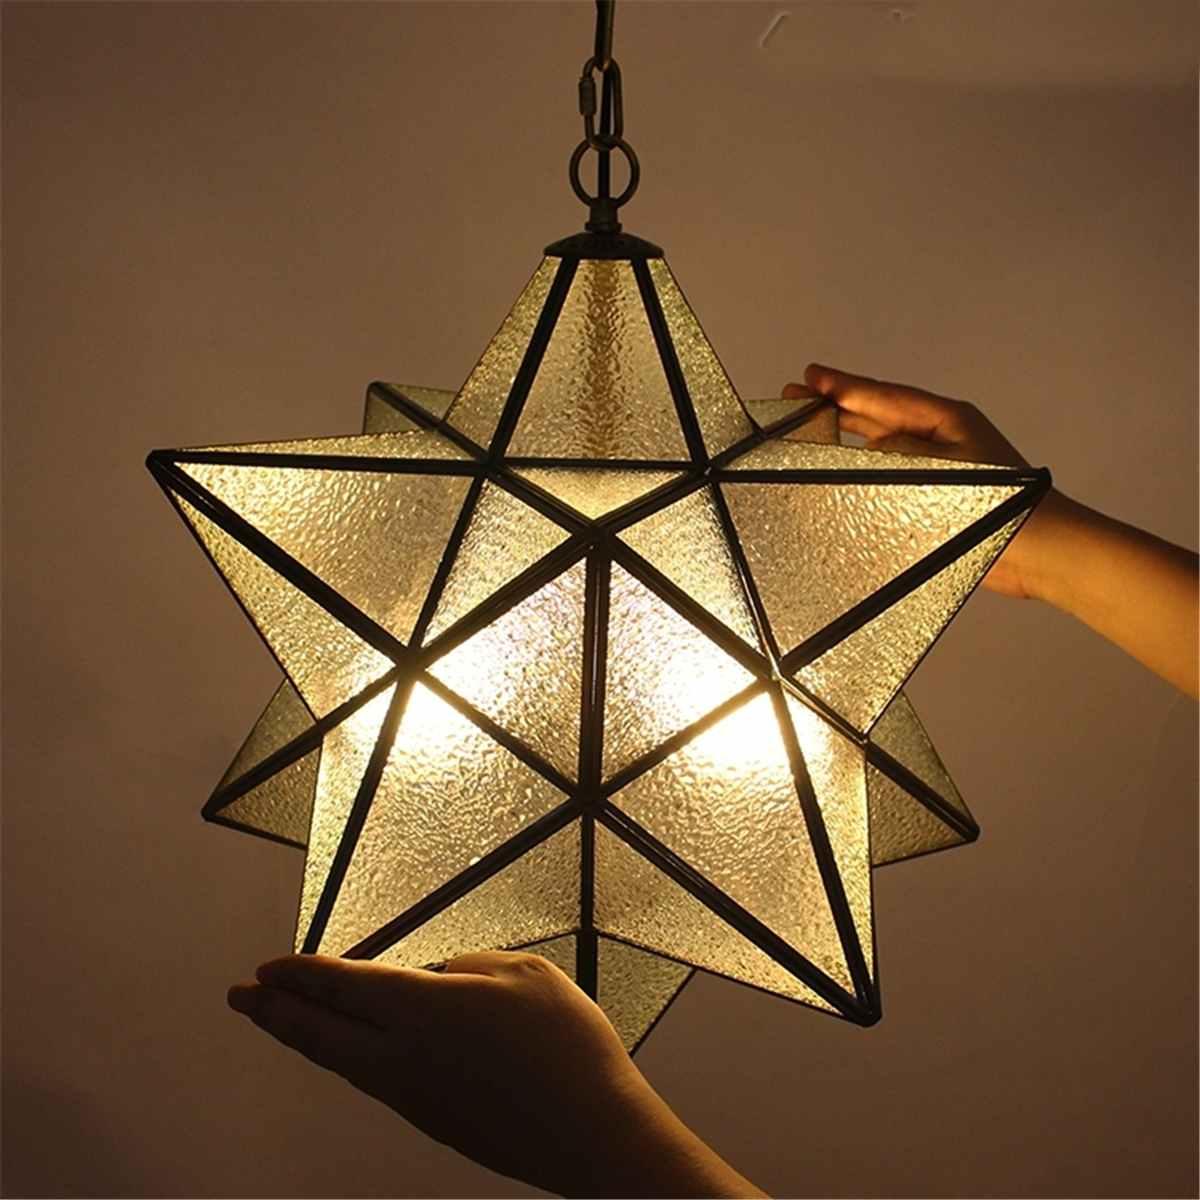 Lámpara colgante de cristal de estrella Morava, lámpara moderna, accesorio decorativo